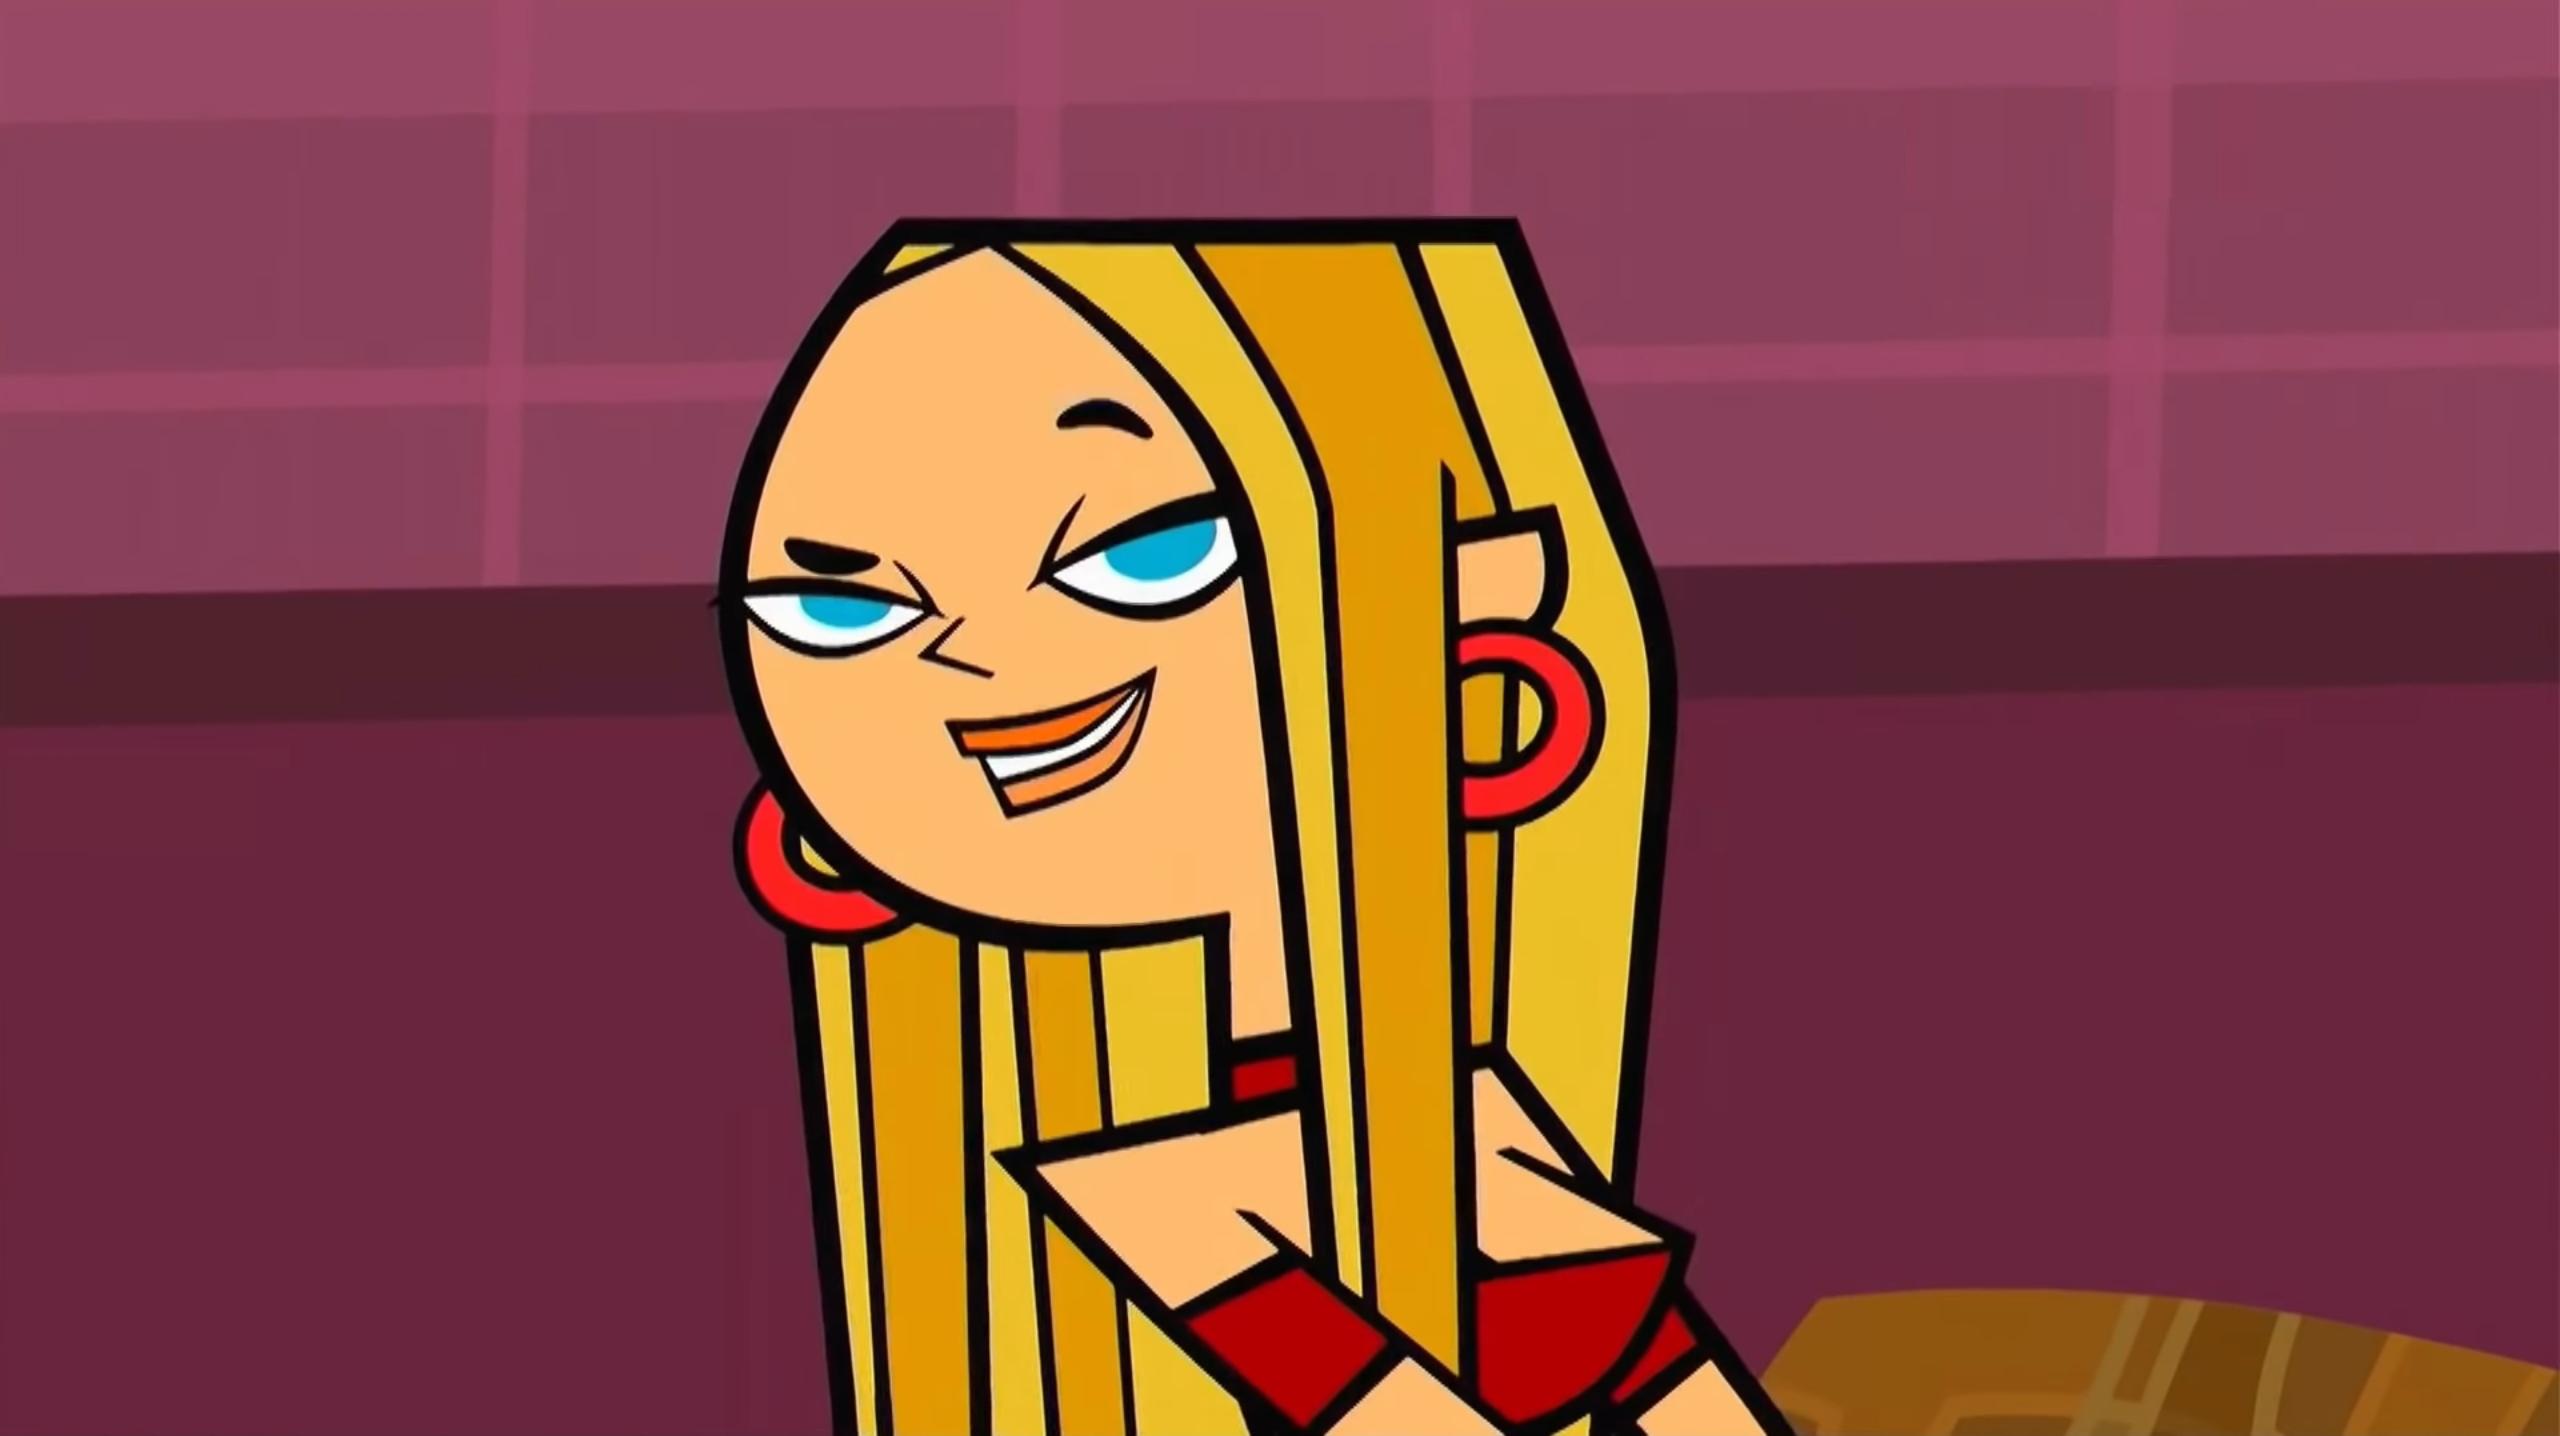 DressUp gift. Blaineley - Al | Cartoon movie characters